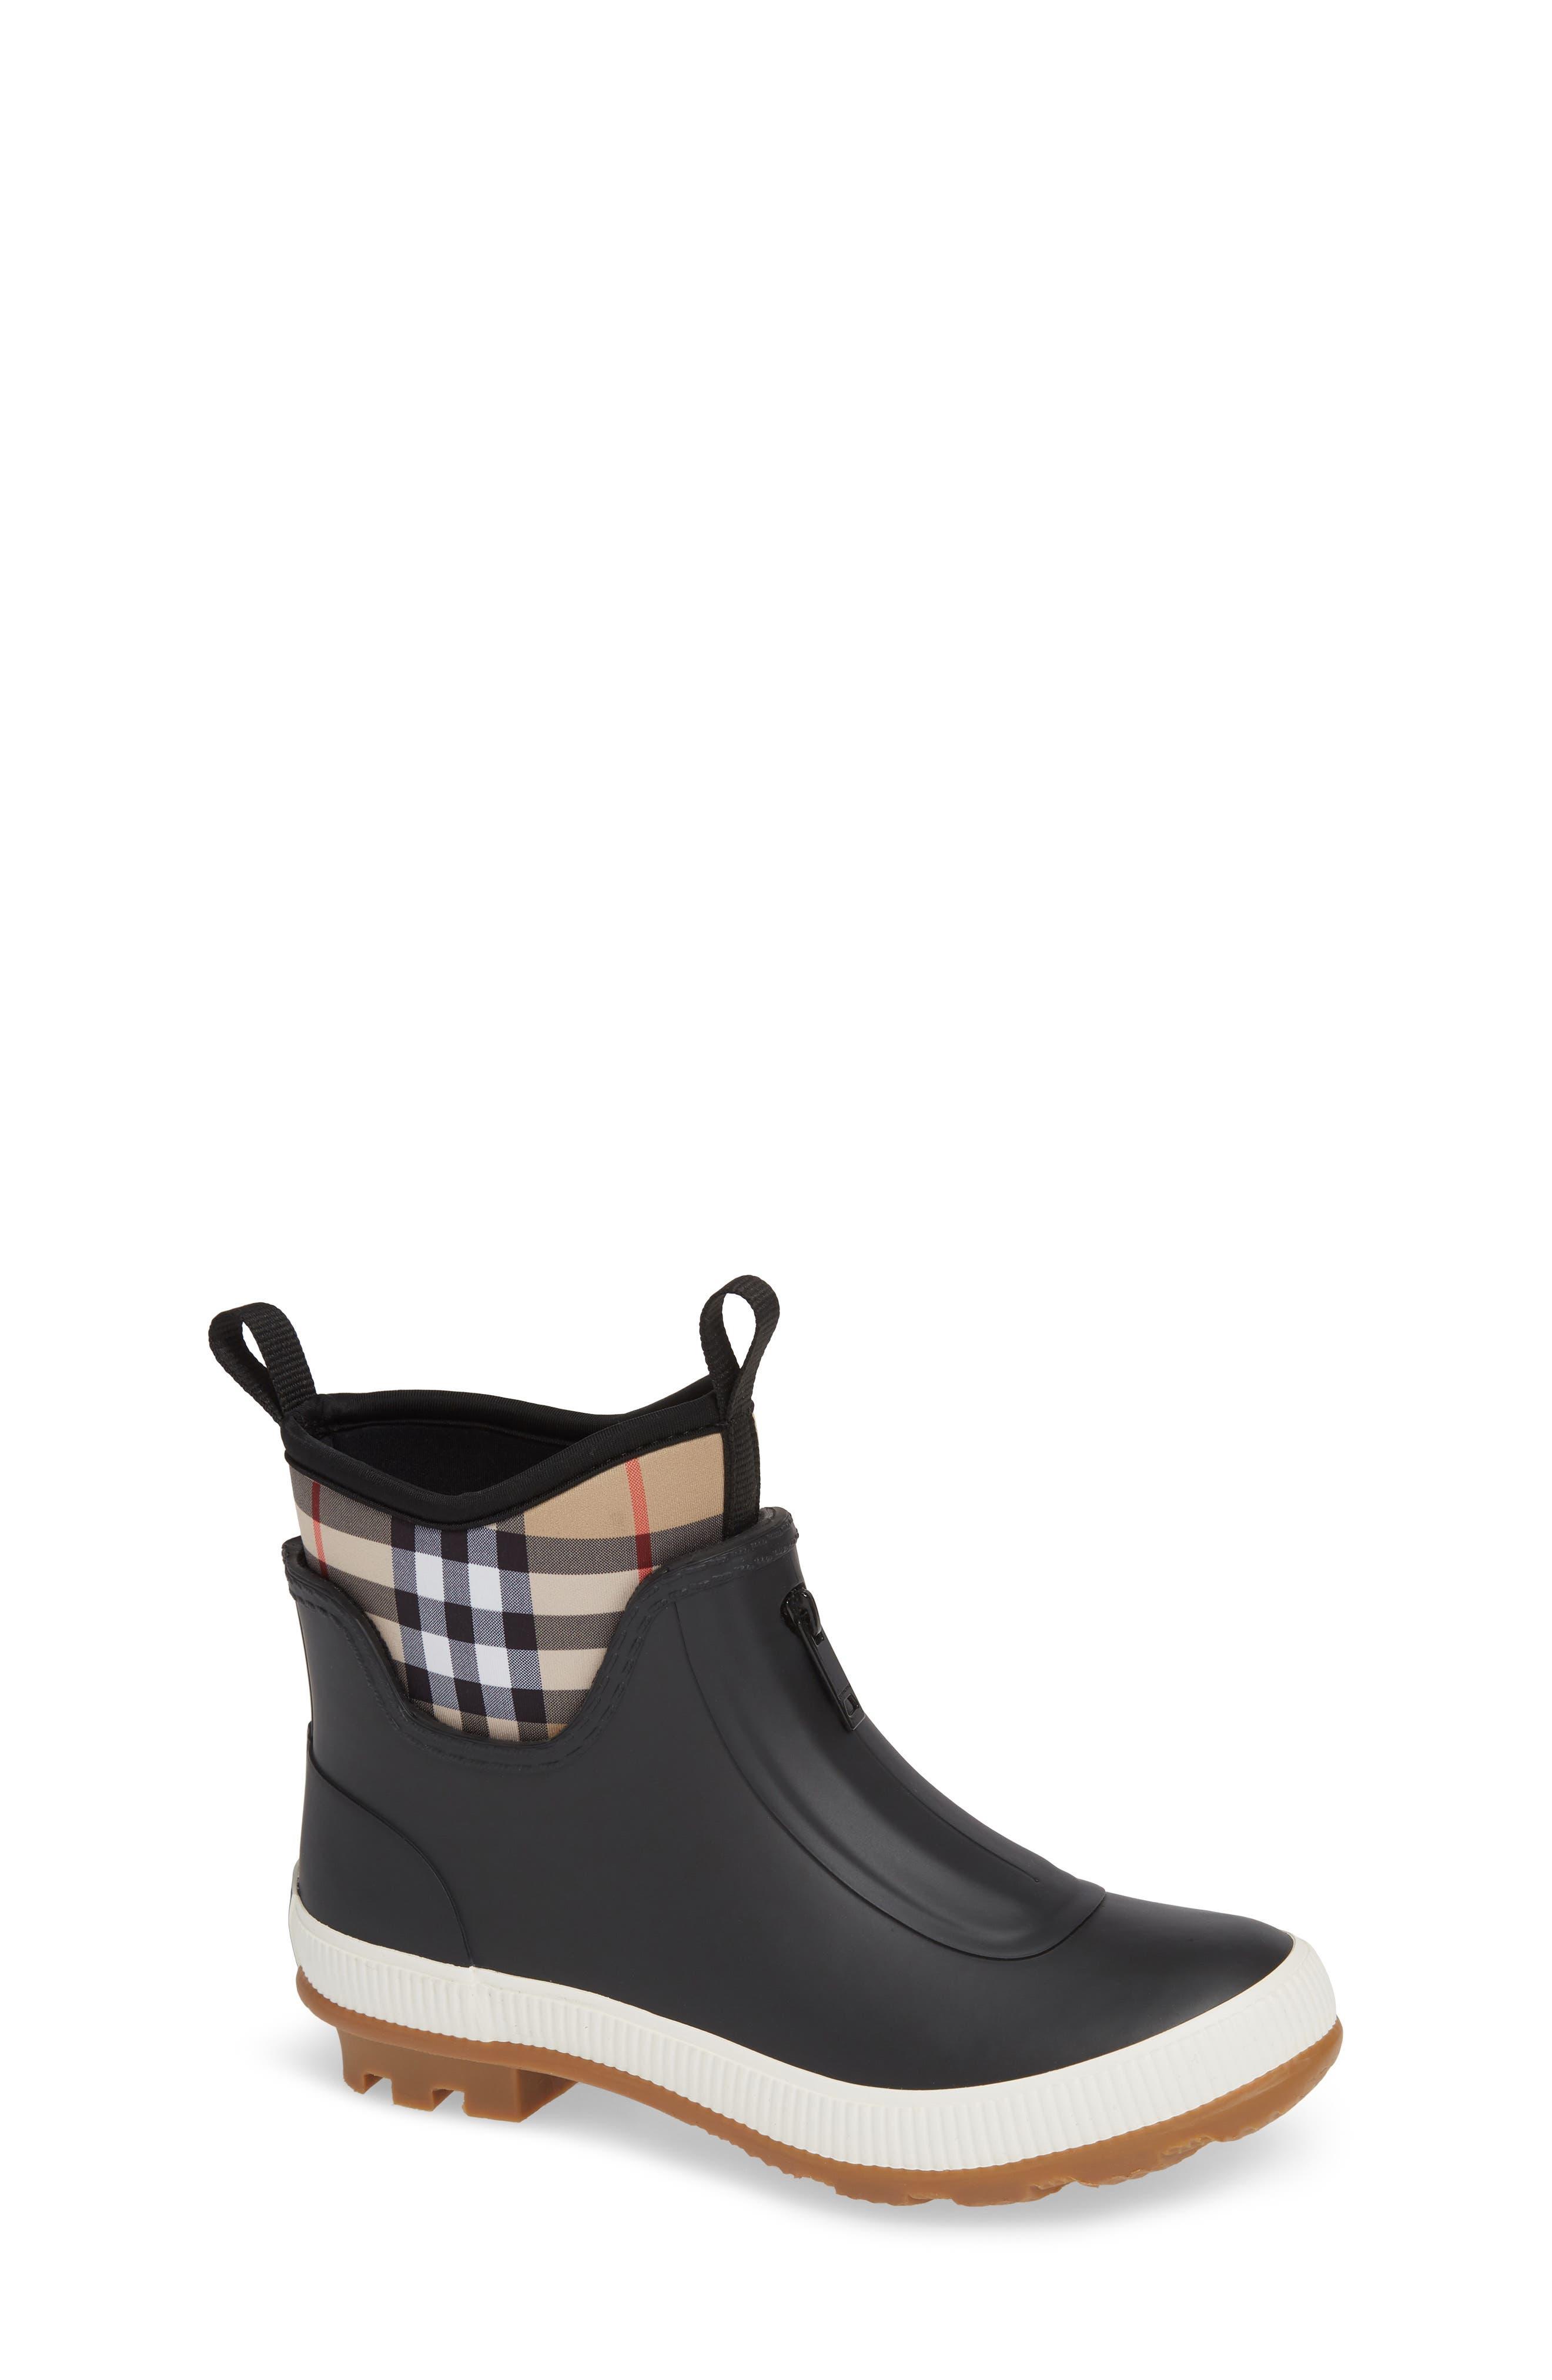 BURBERRY Flinton Rain Boot, Main, color, BLACK